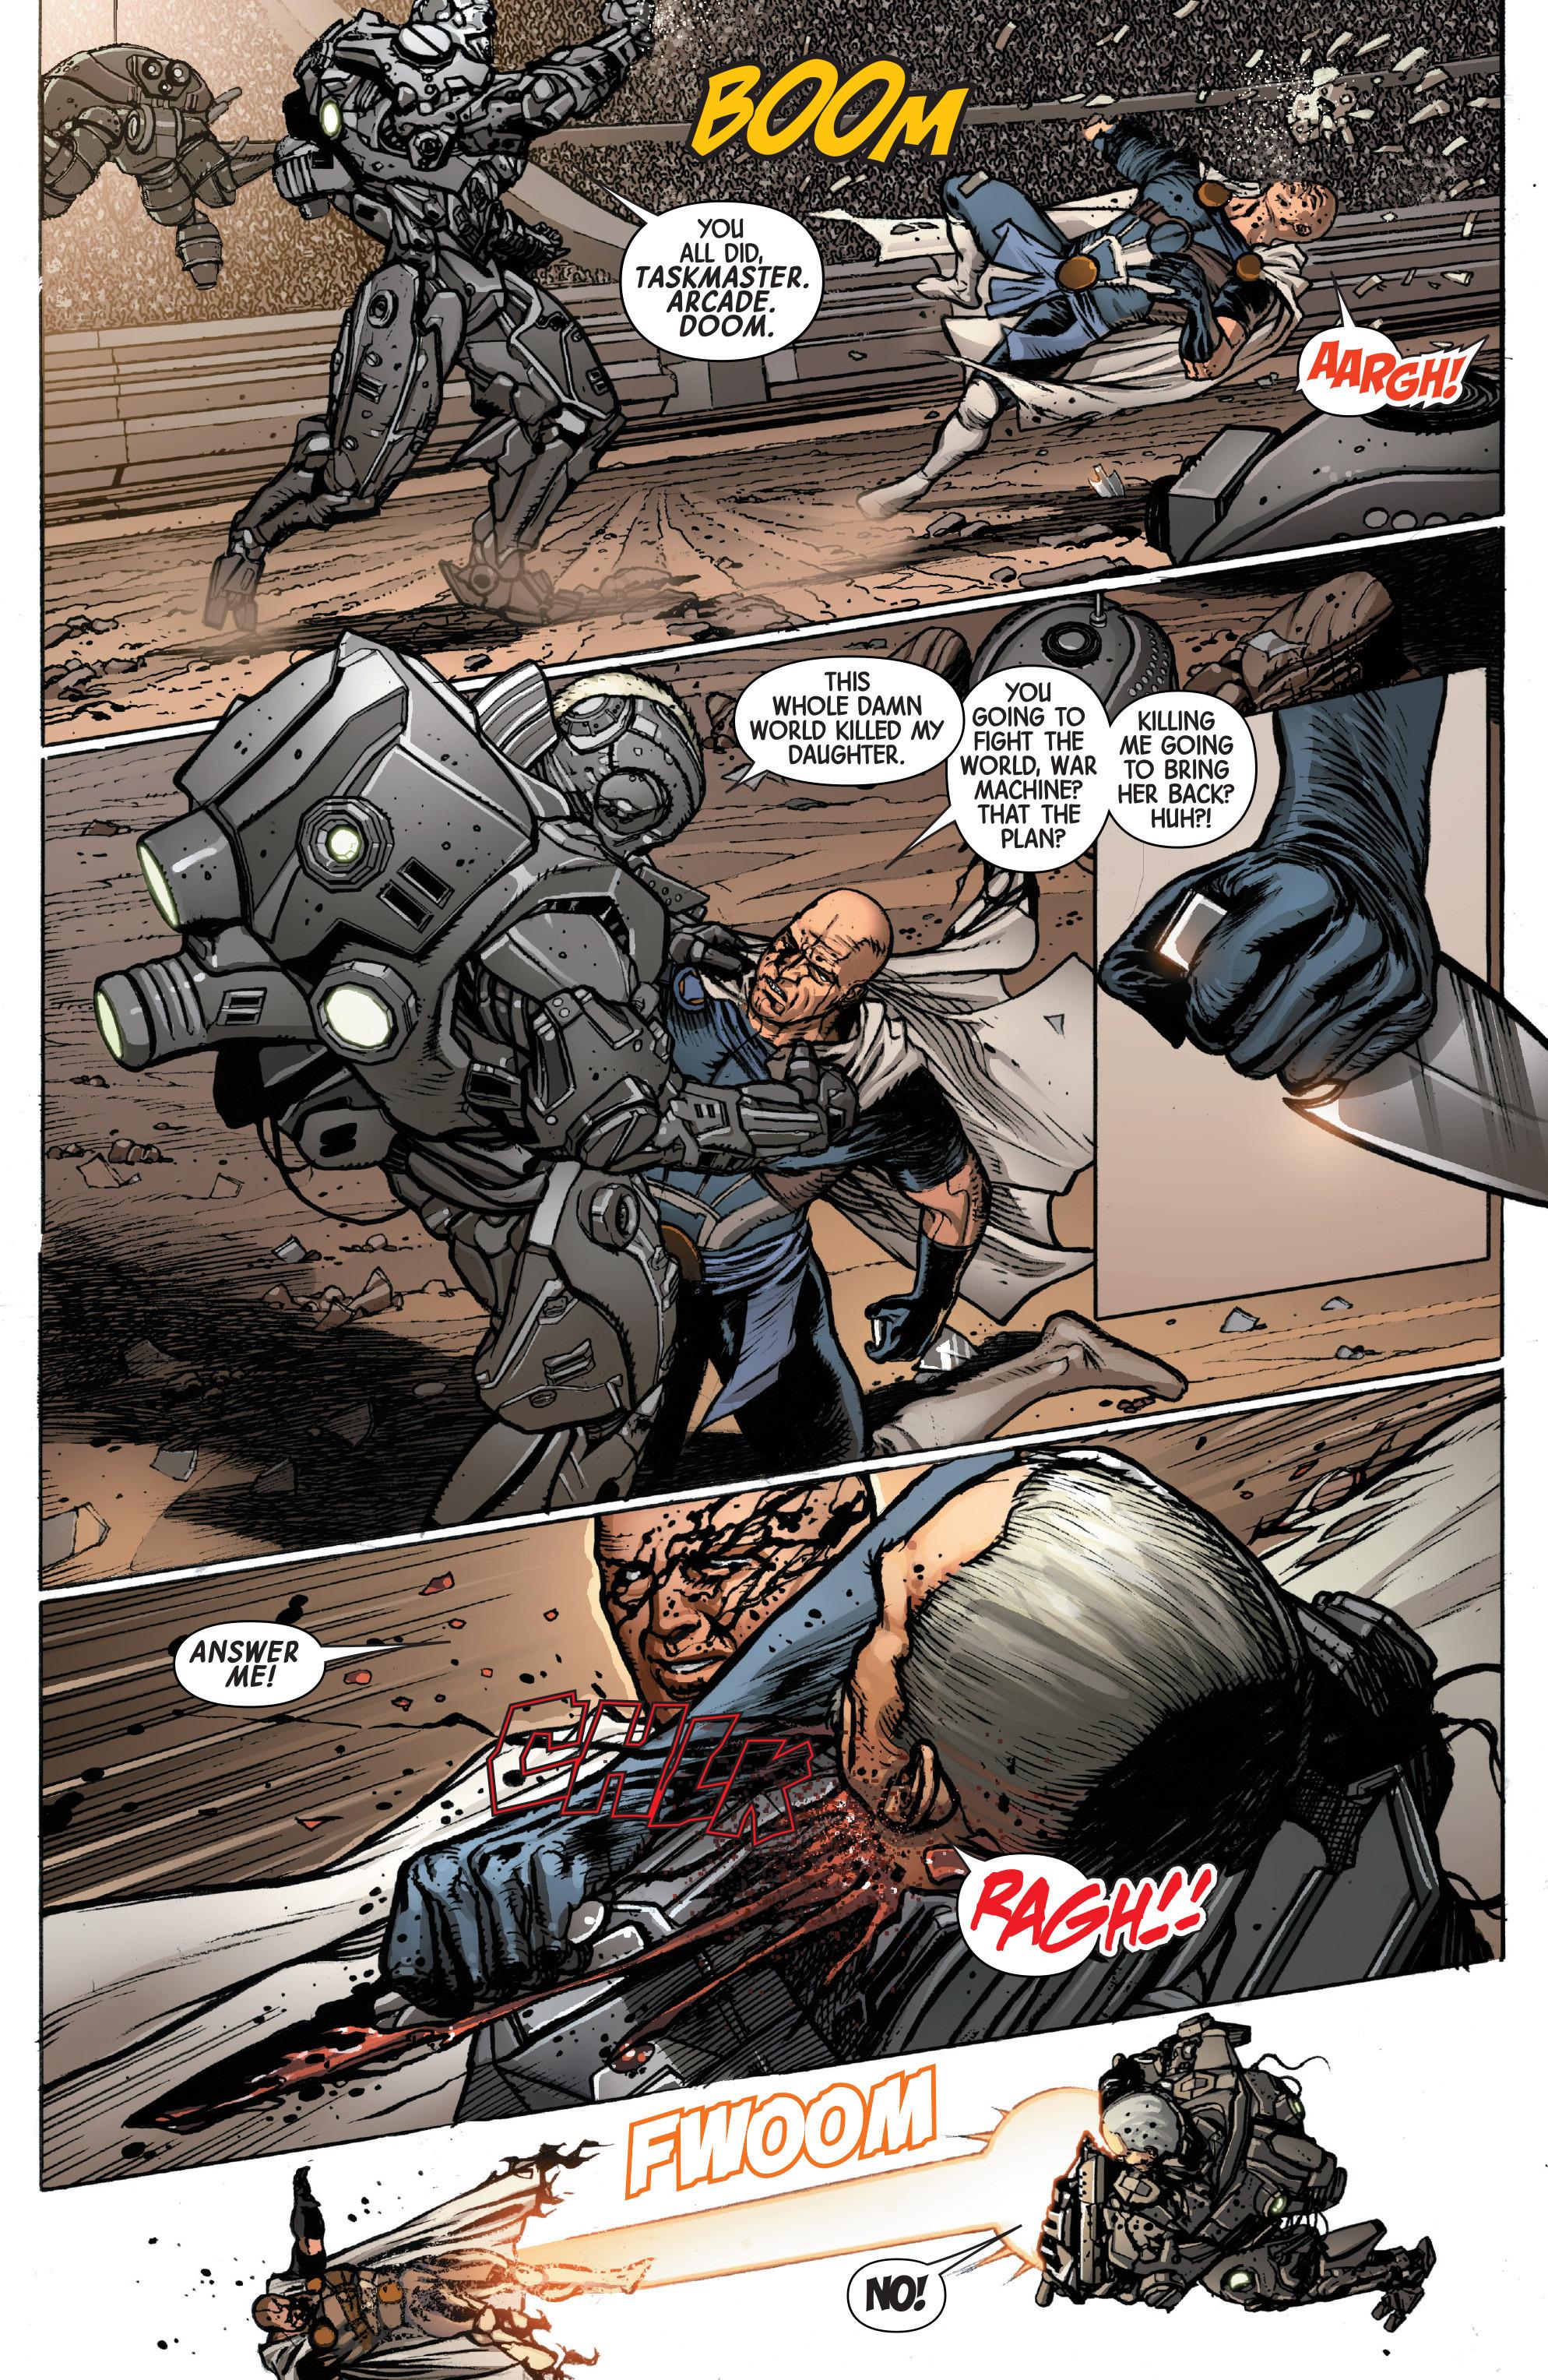 Read online Secret Wars Journal/Battleworld comic -  Issue # TPB - 162